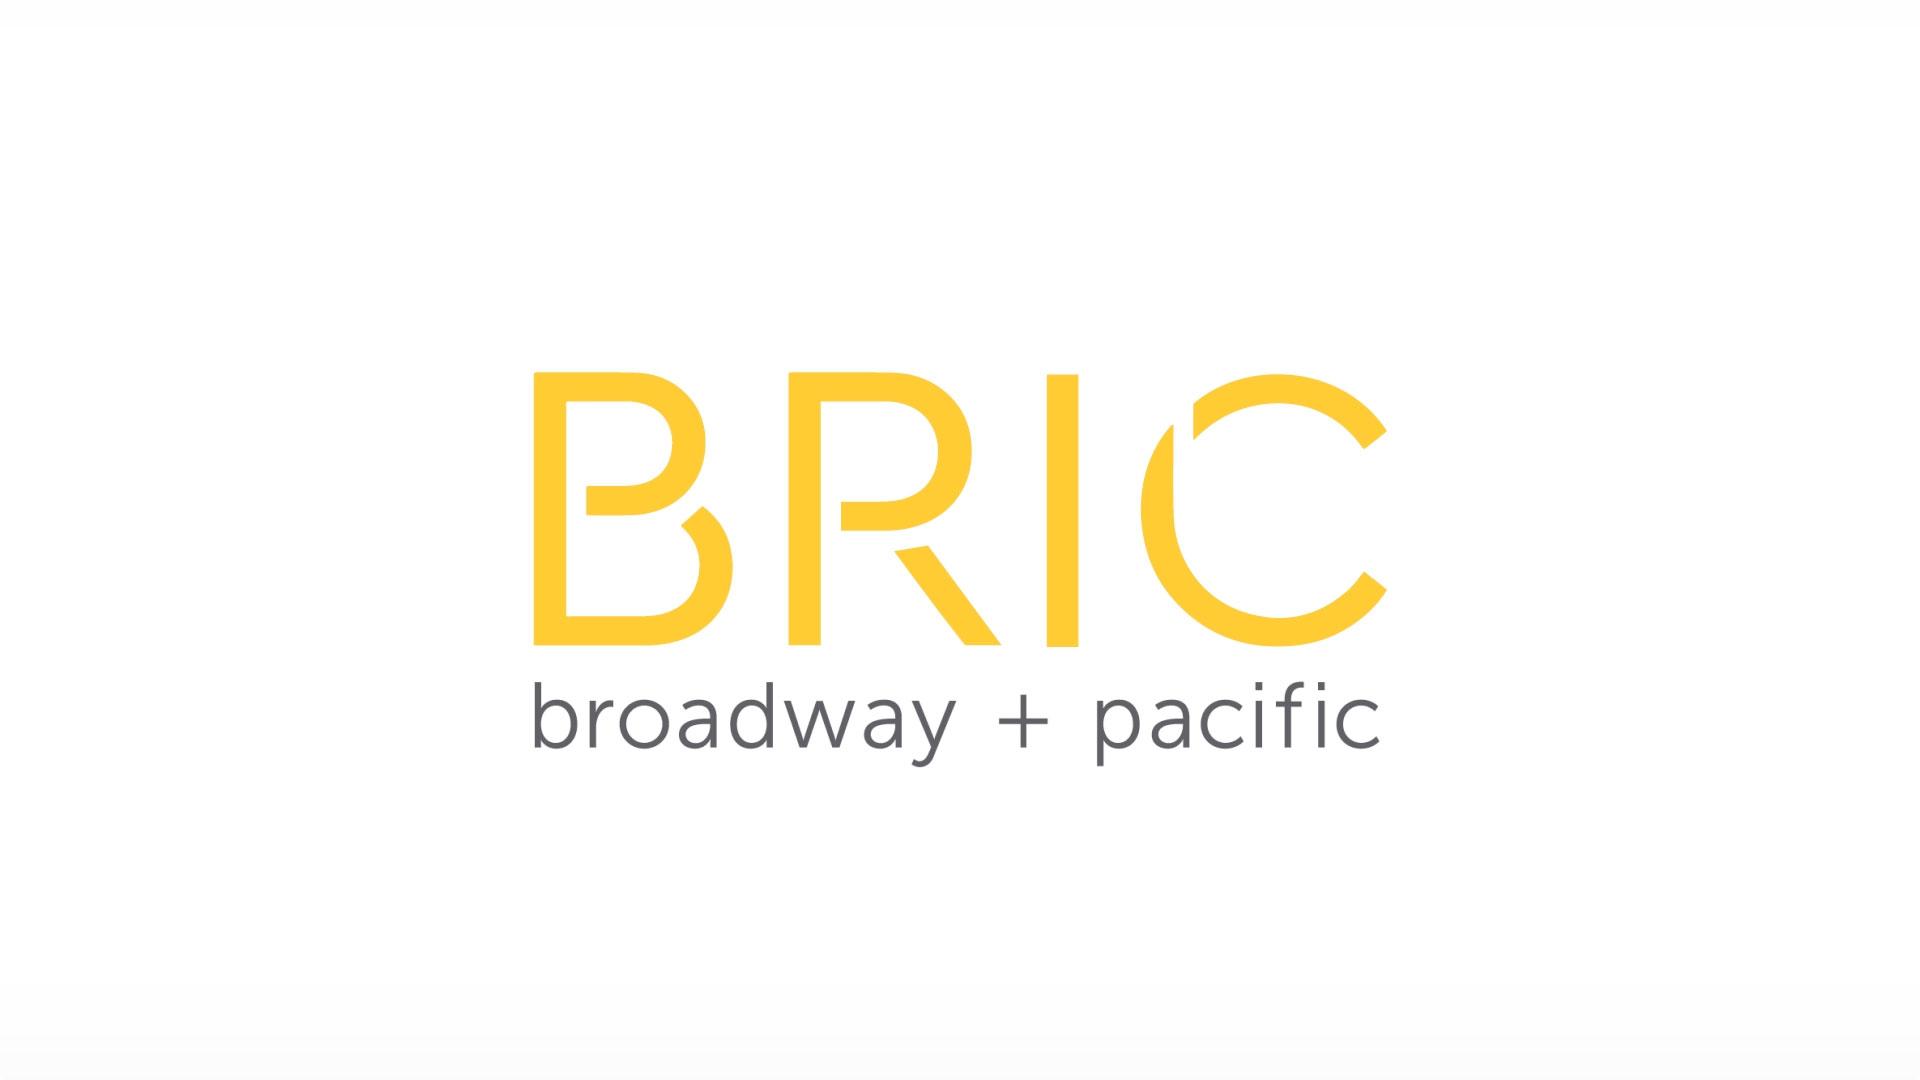 BRIC - broadway + pacific